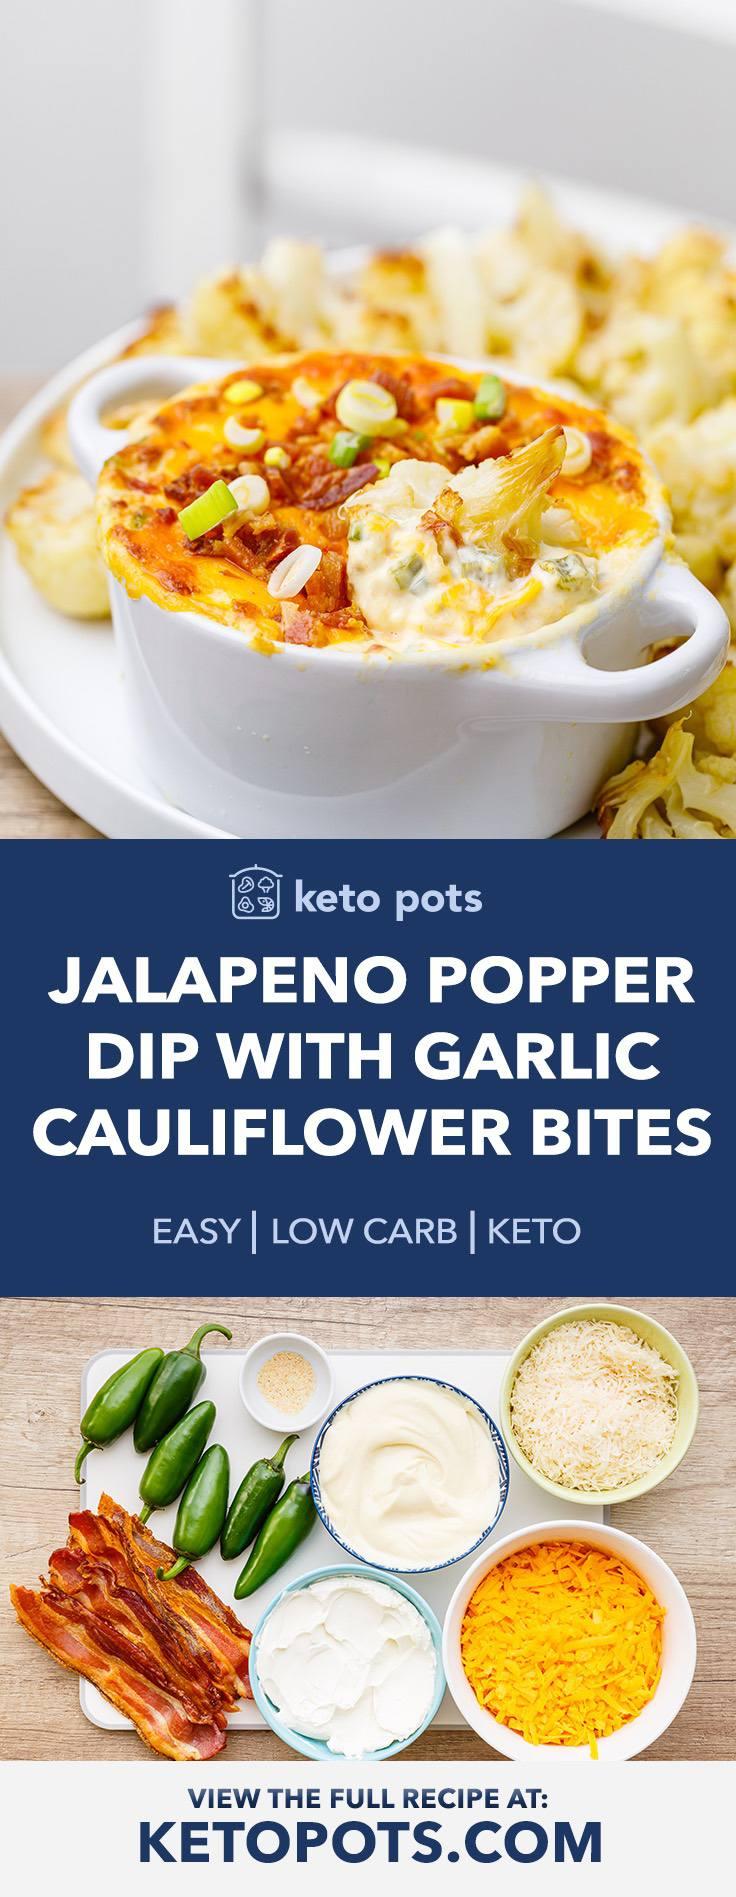 Jalapeno Popper Dip with Garlic Roasted Cauliflower Bites